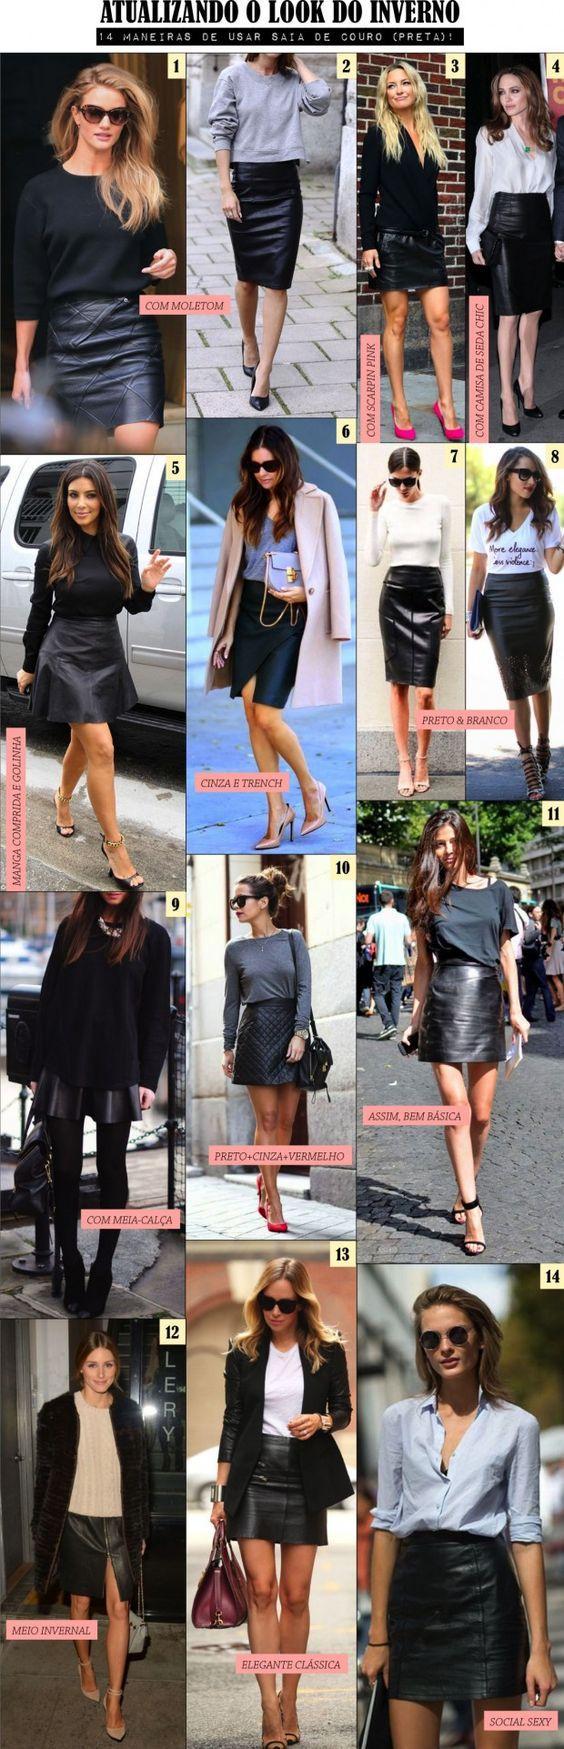 COMO USAR SAIA DE COURO - Fashionismo: